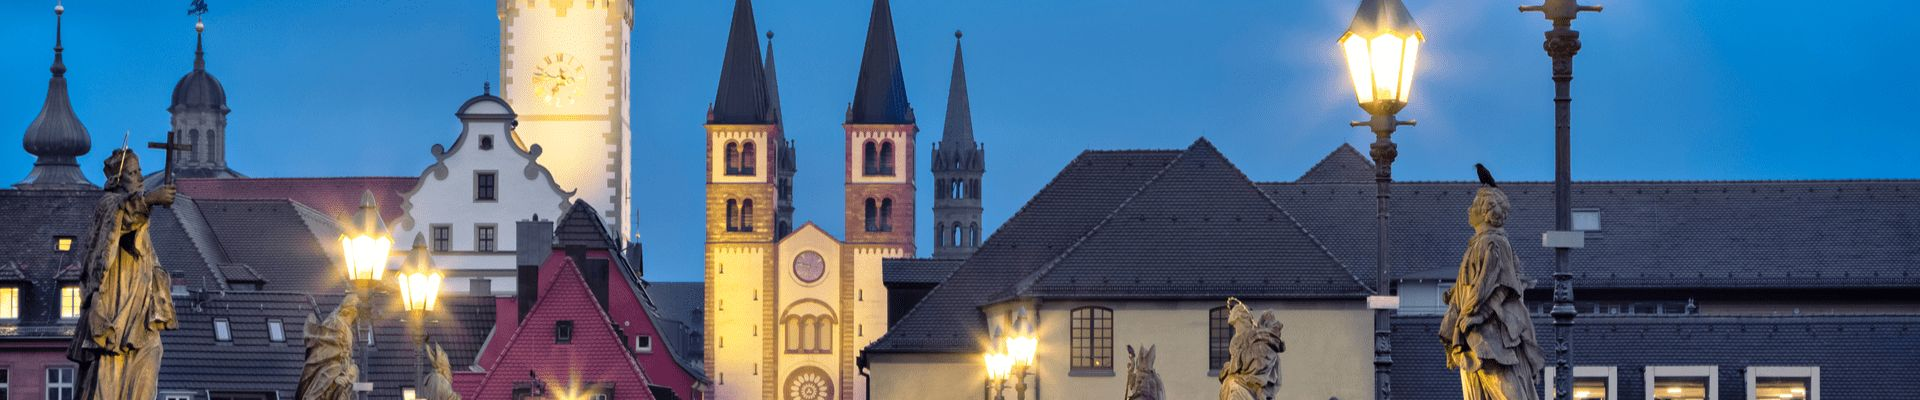 Wellnesshotels in Unterfranken